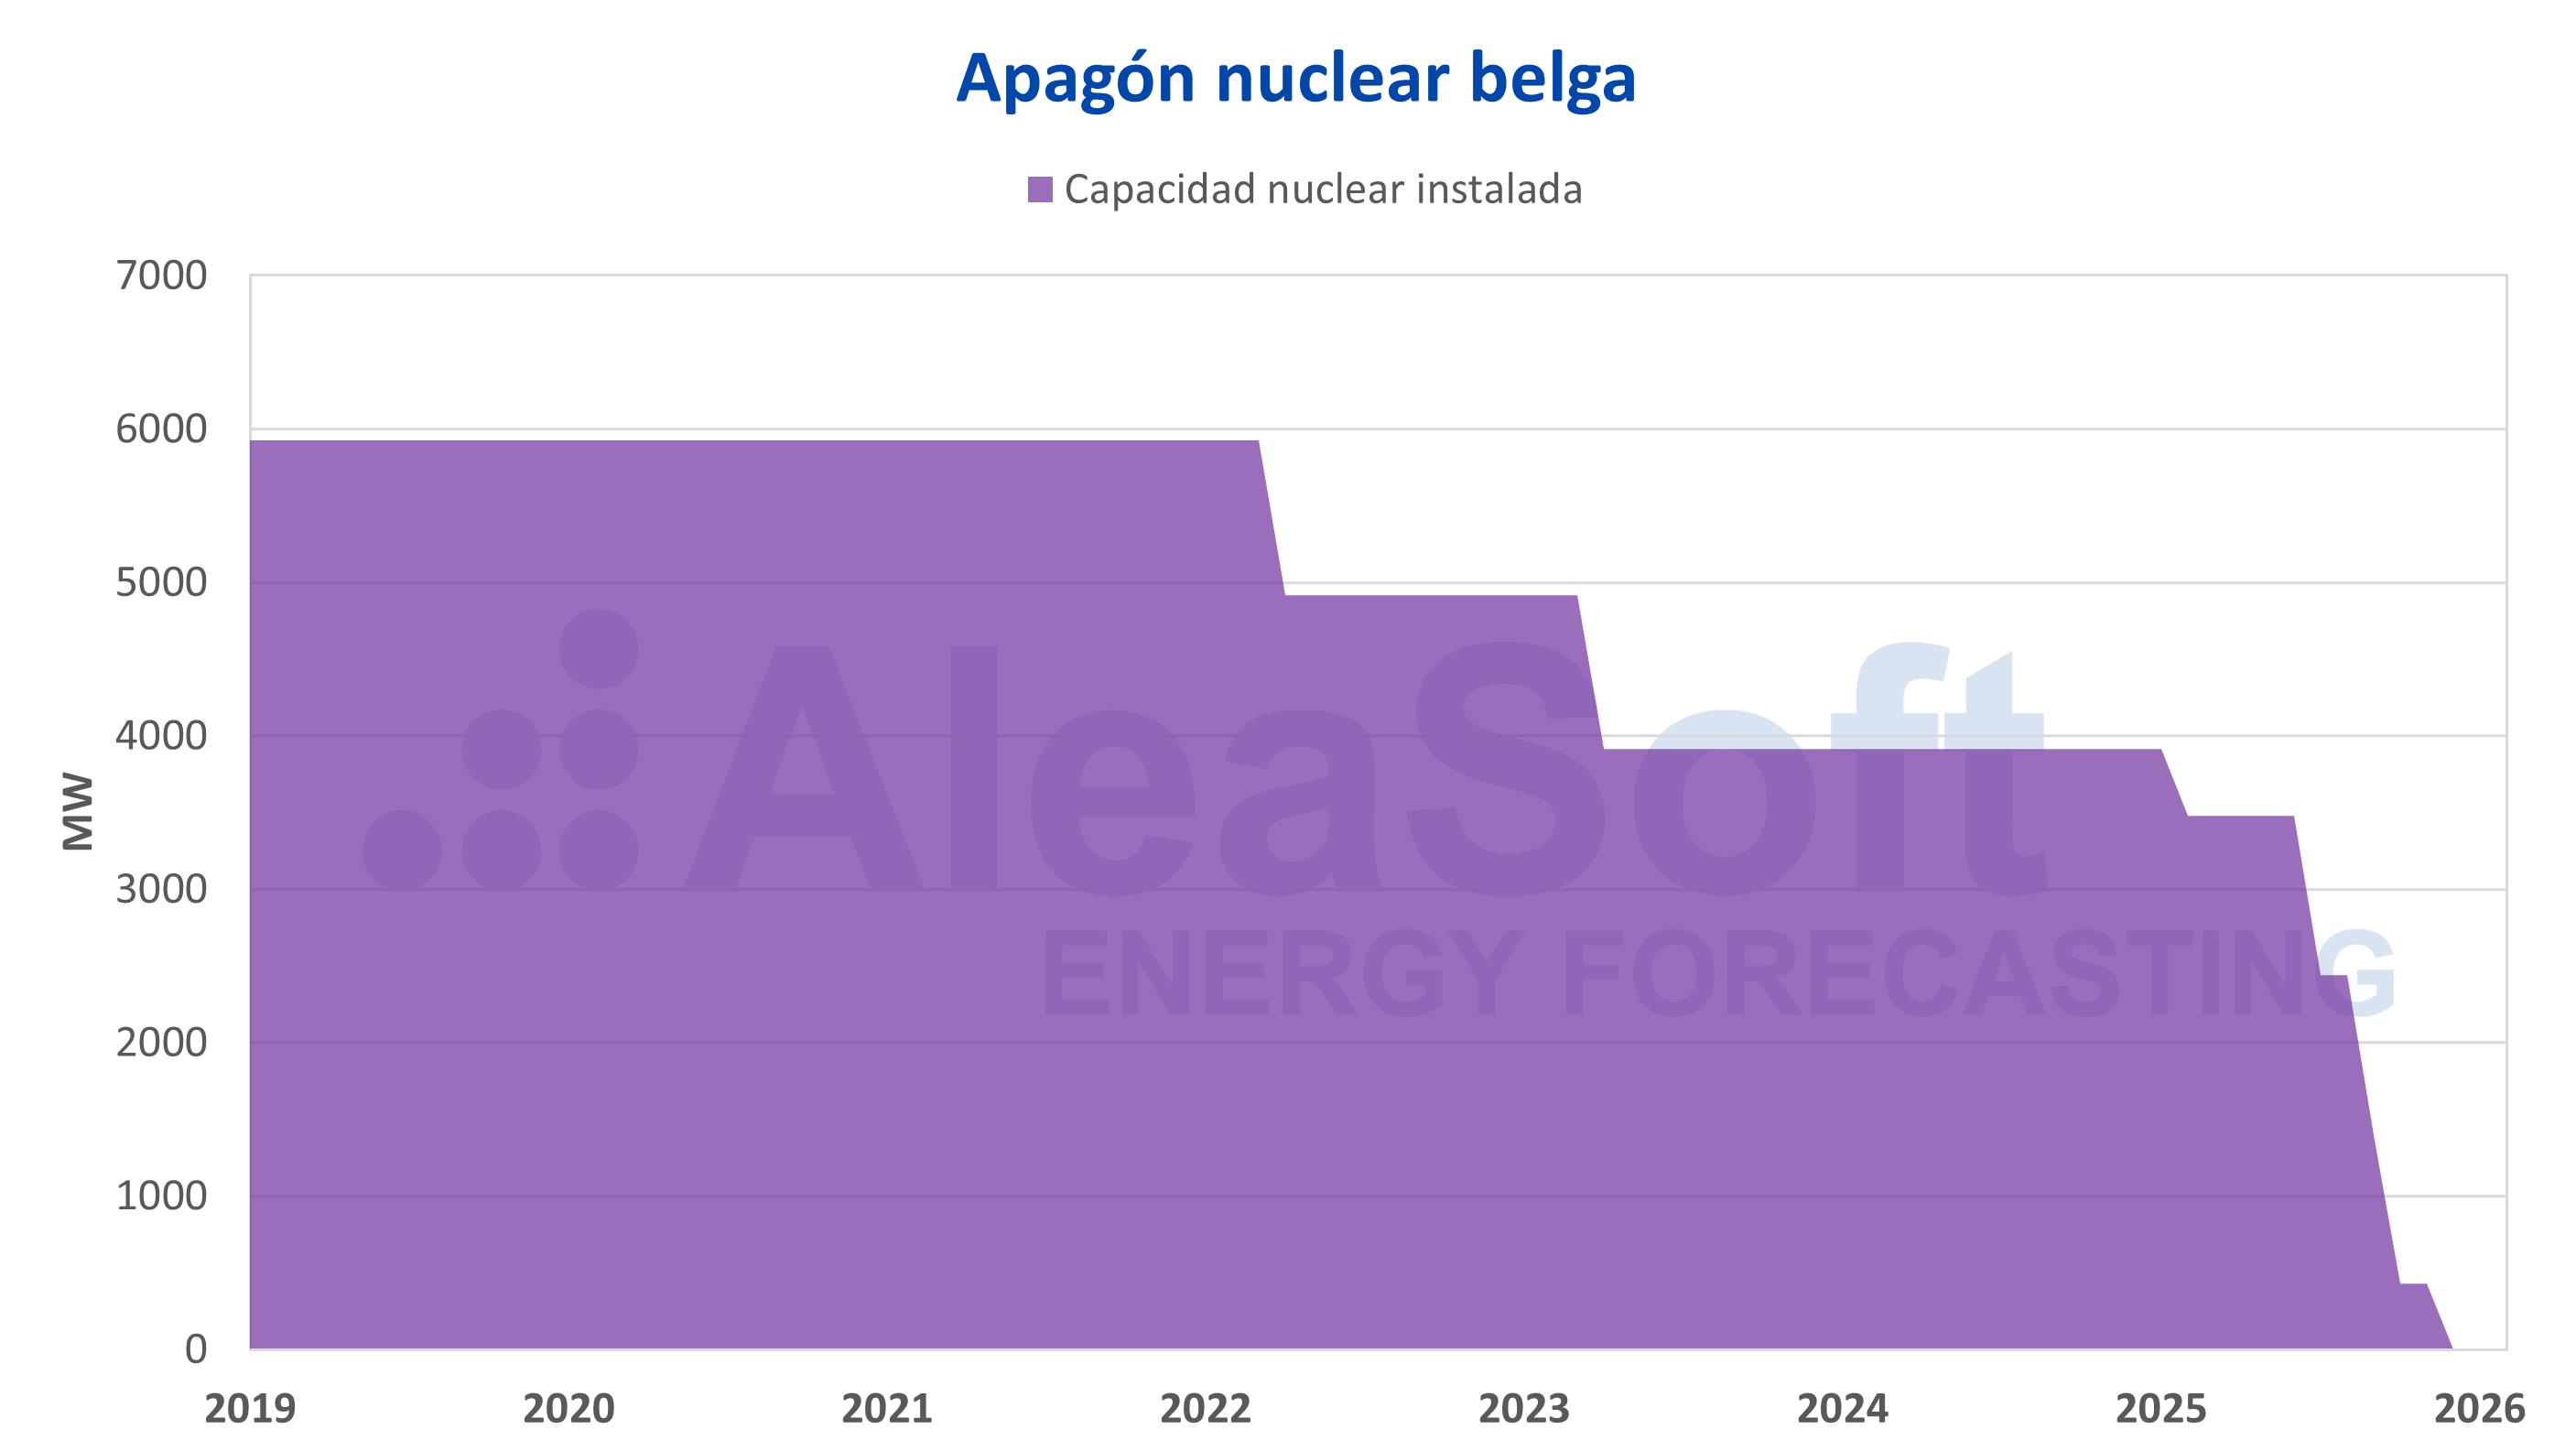 AleaSoft - Belgica apagon nuclear